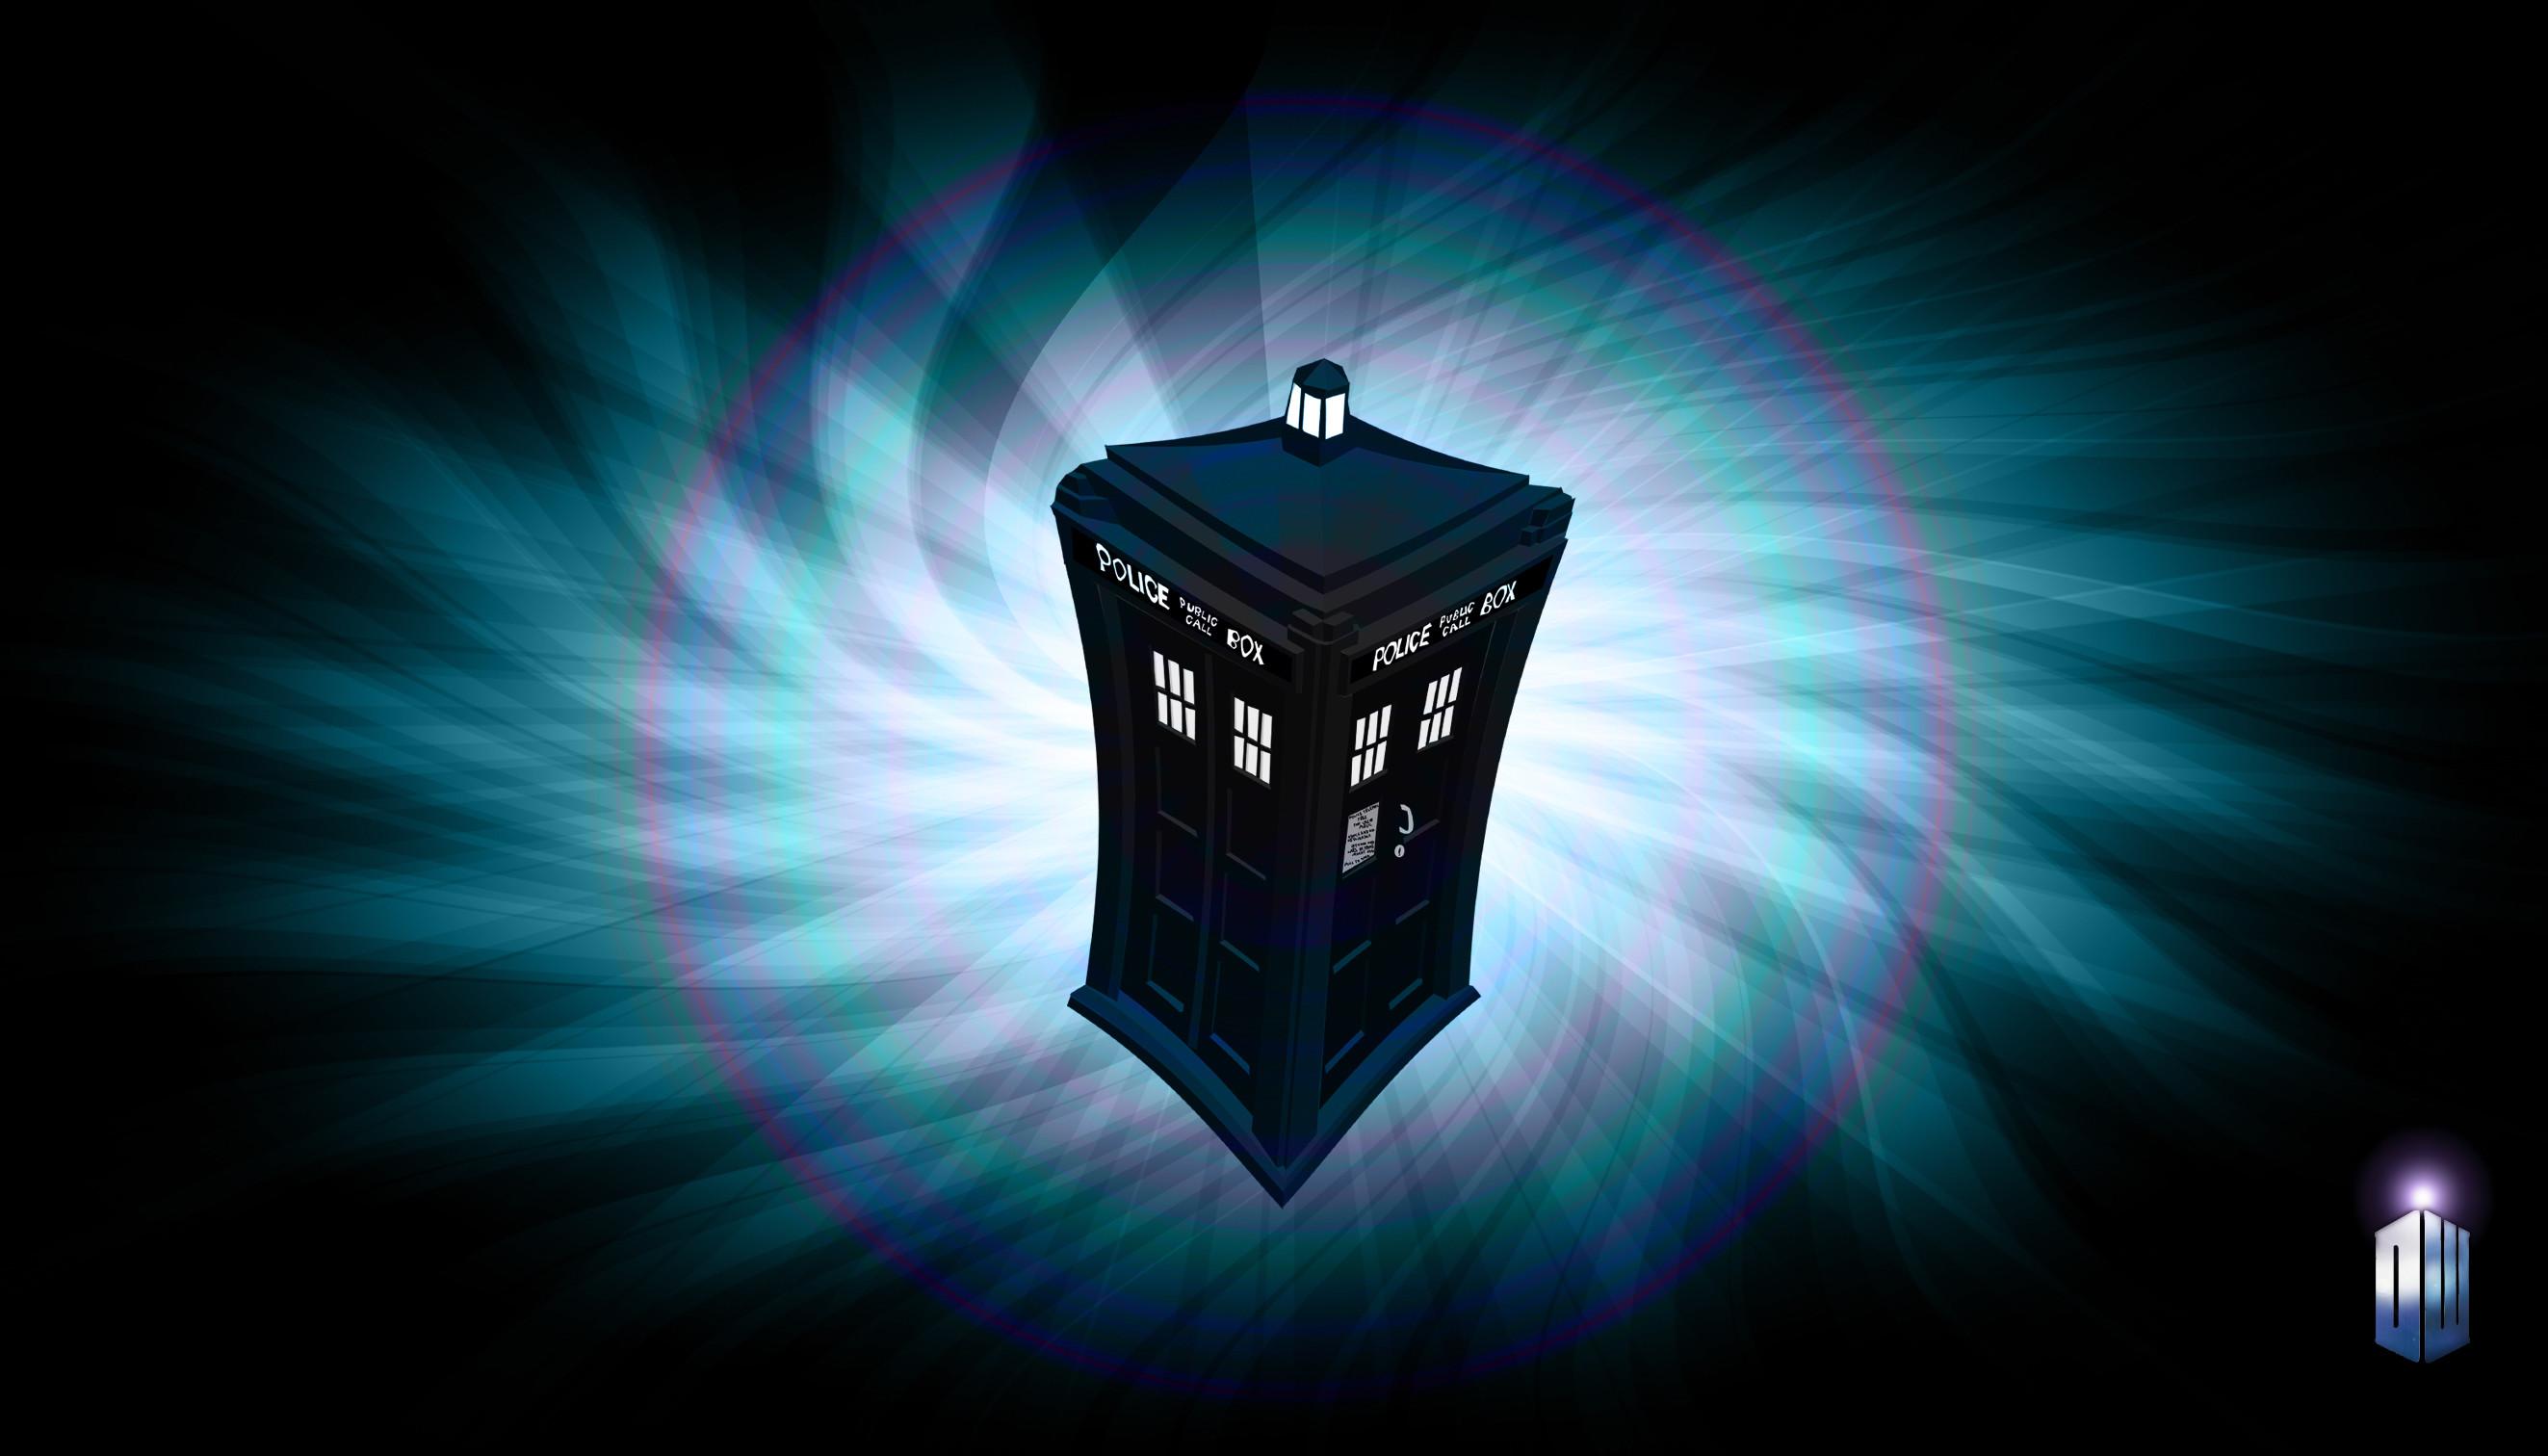 Doctor Who HD Desktop Background Wallpaper